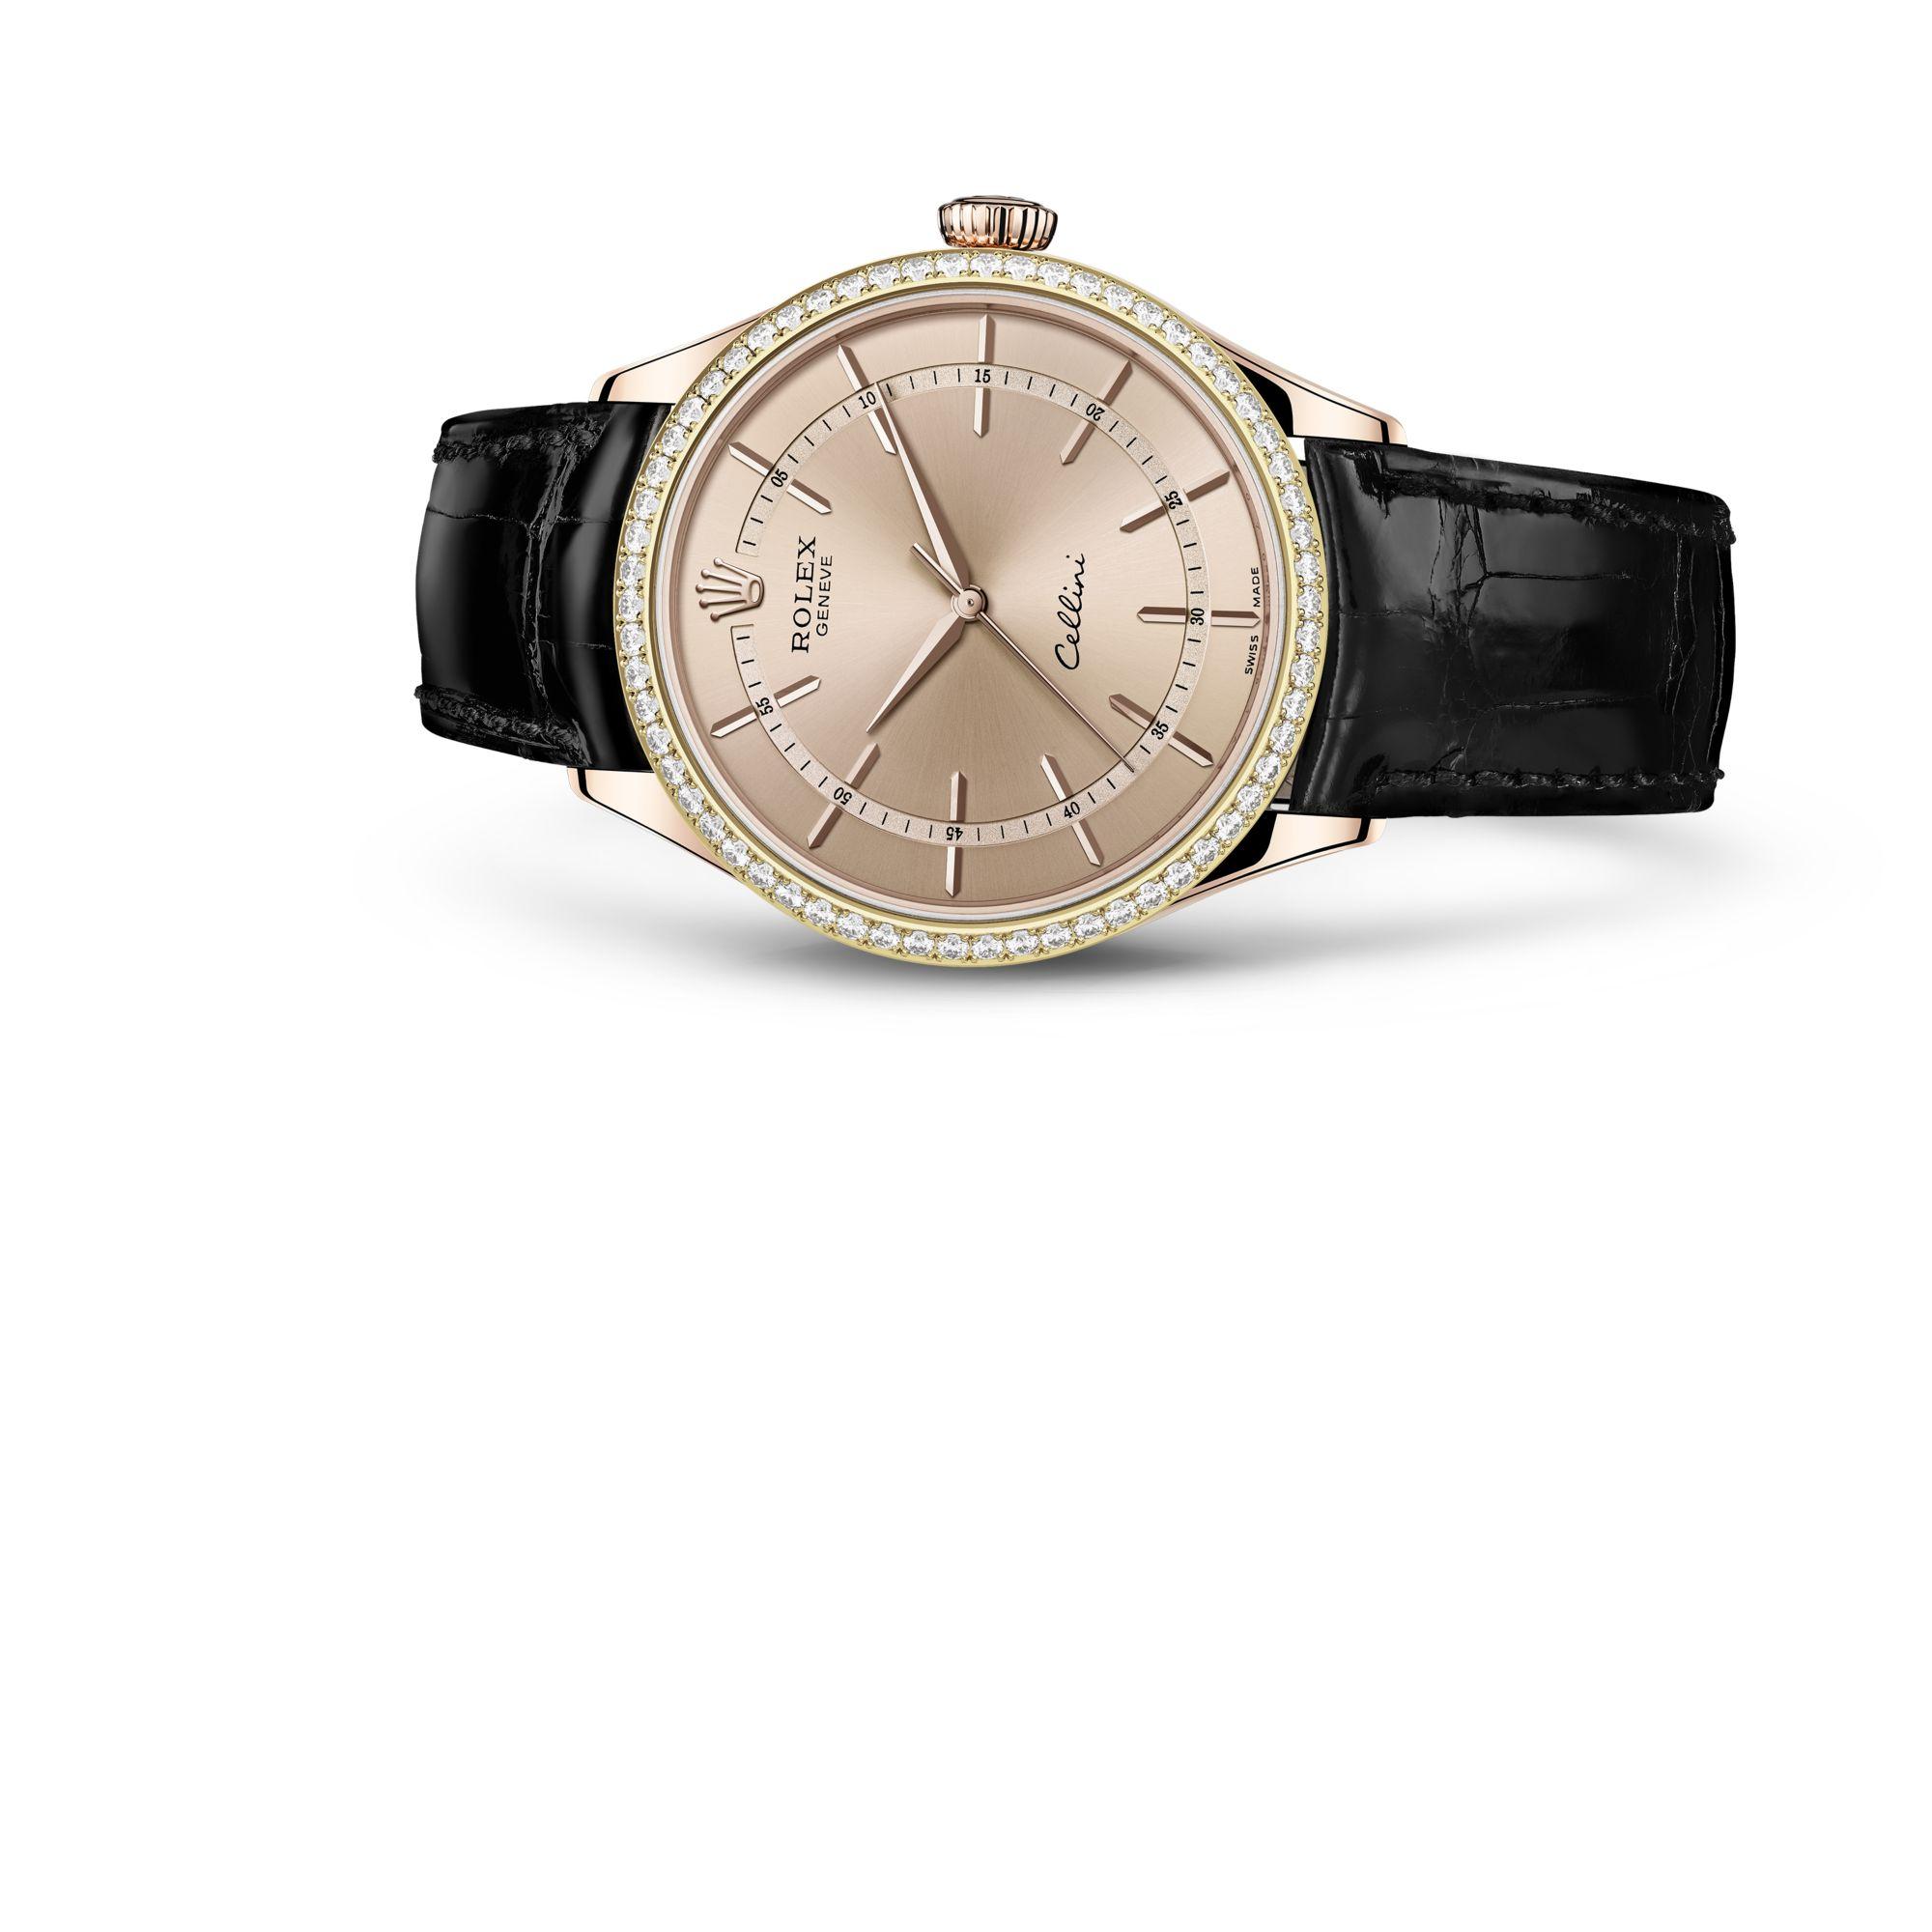 Rolex Cellini Time M50705RBR-0010